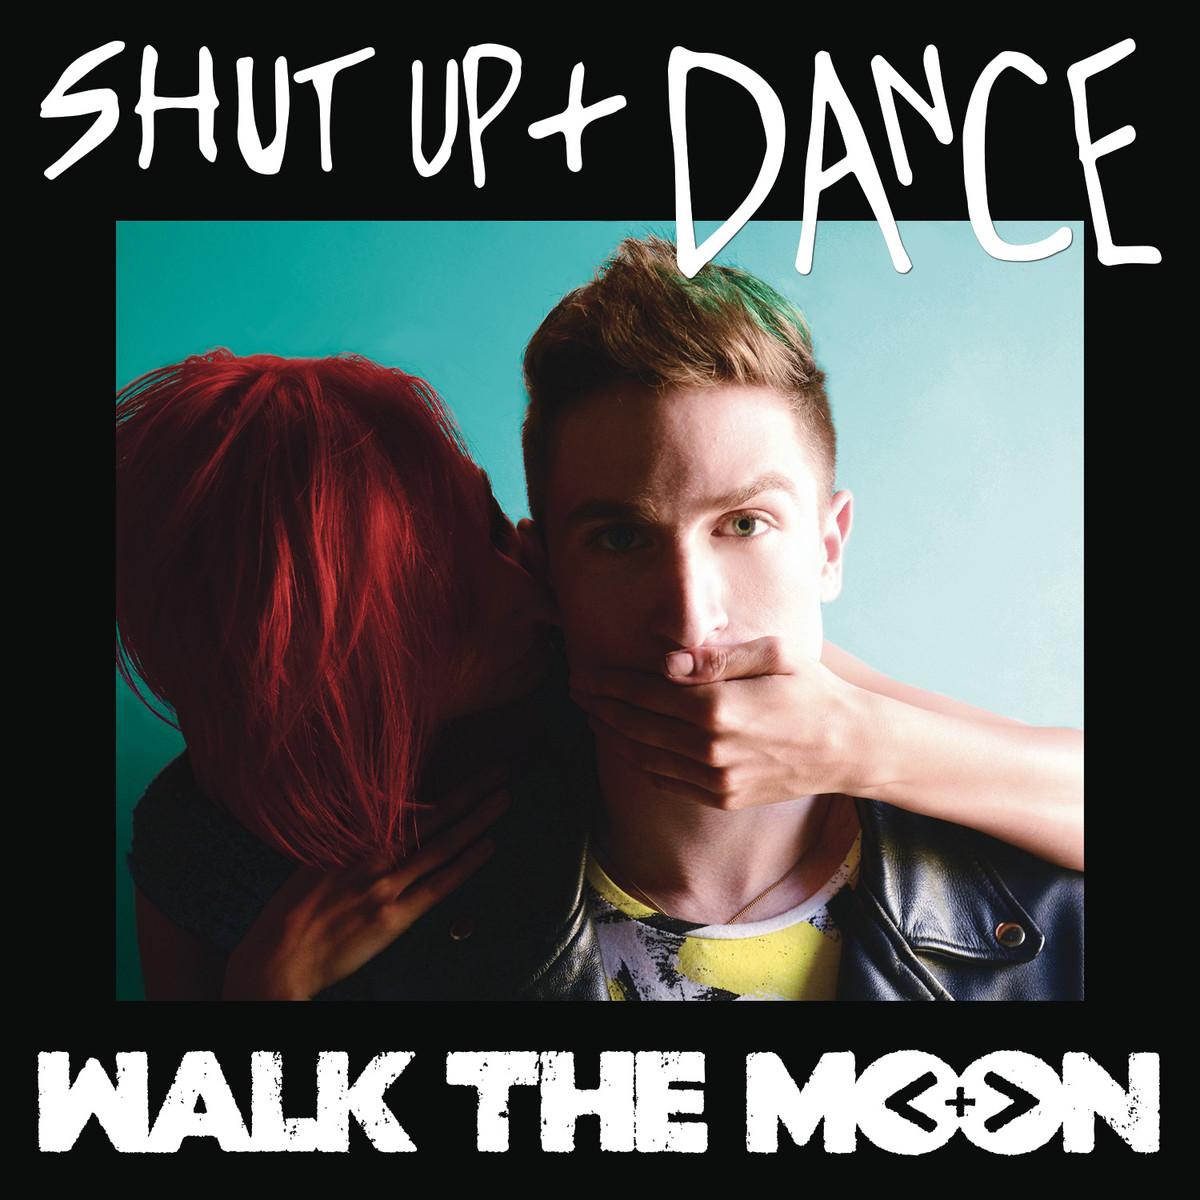 Kumpulan lirik lagu shut up and dance lyrics walk the moon for 1234 get on the dance floor song with lyrics